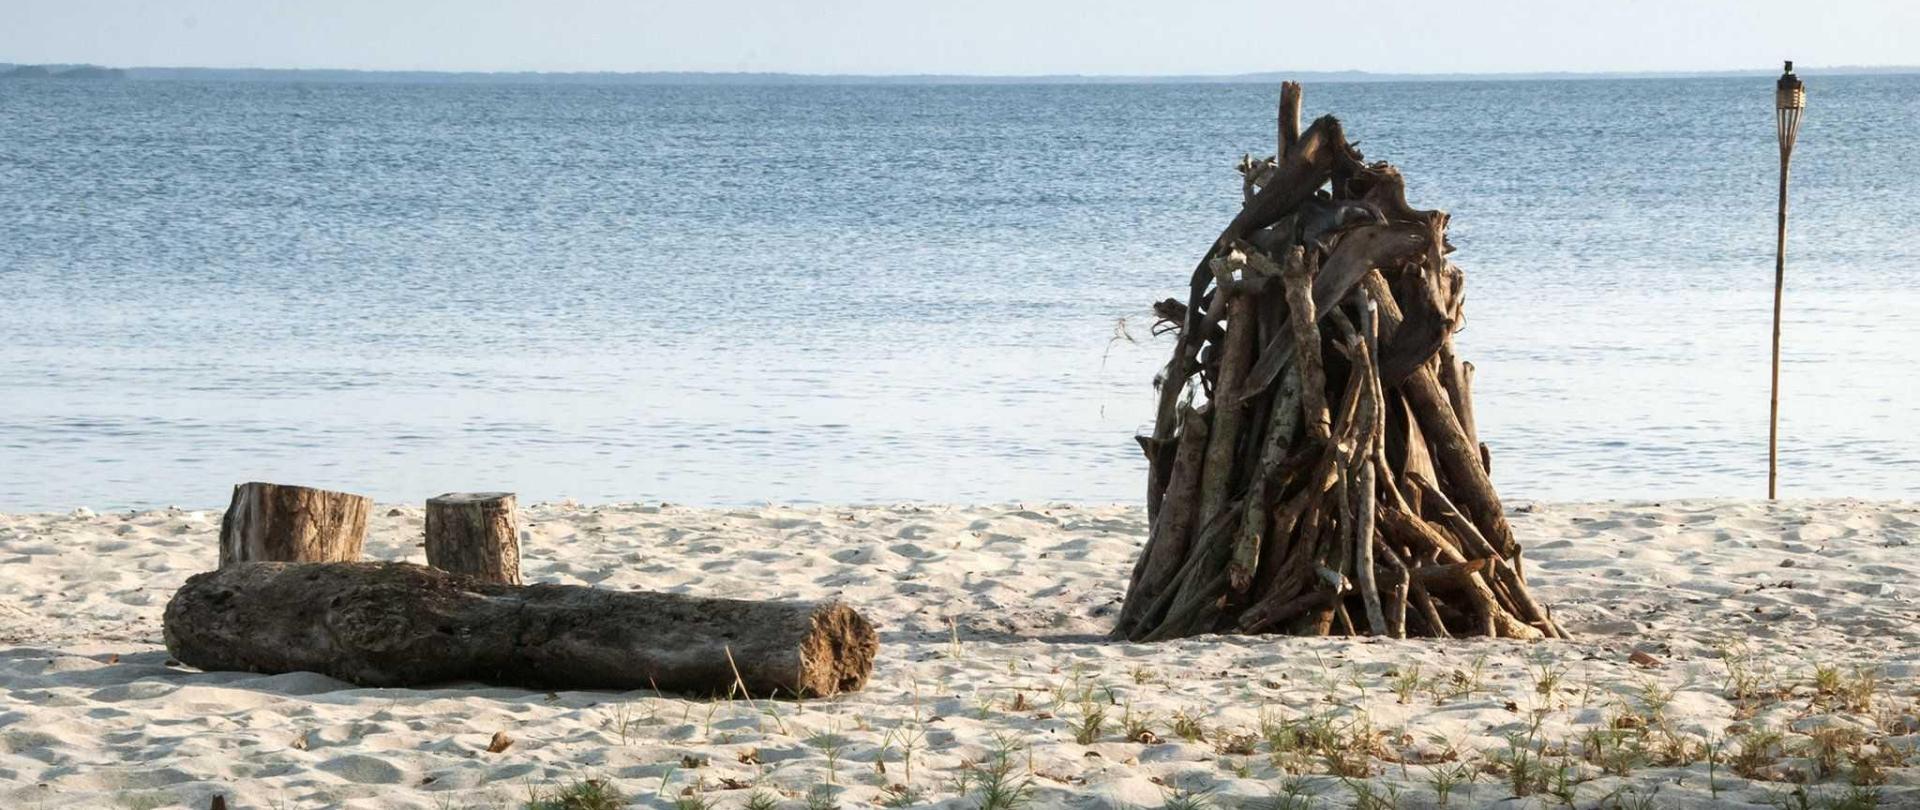 hotel-playa-manglares-isla-baru-beach-10.jpg